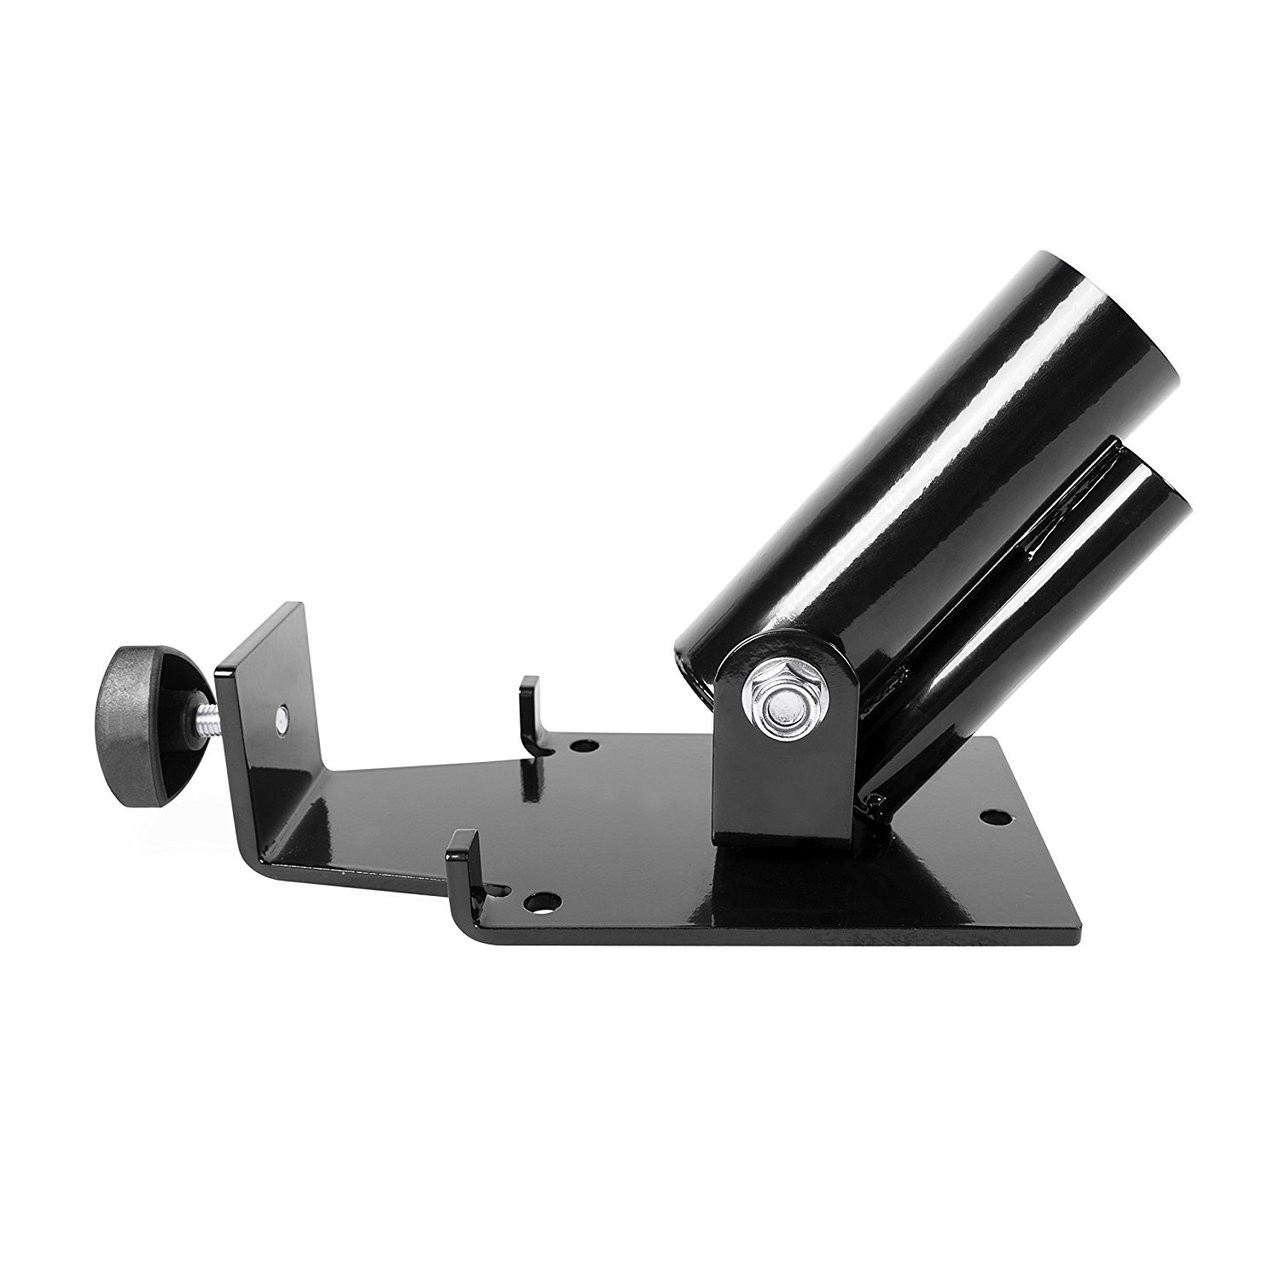 Fits 1 /& 2 Inch Bars CAP Barbell T-Bar Row Attachment Landmine Attachment